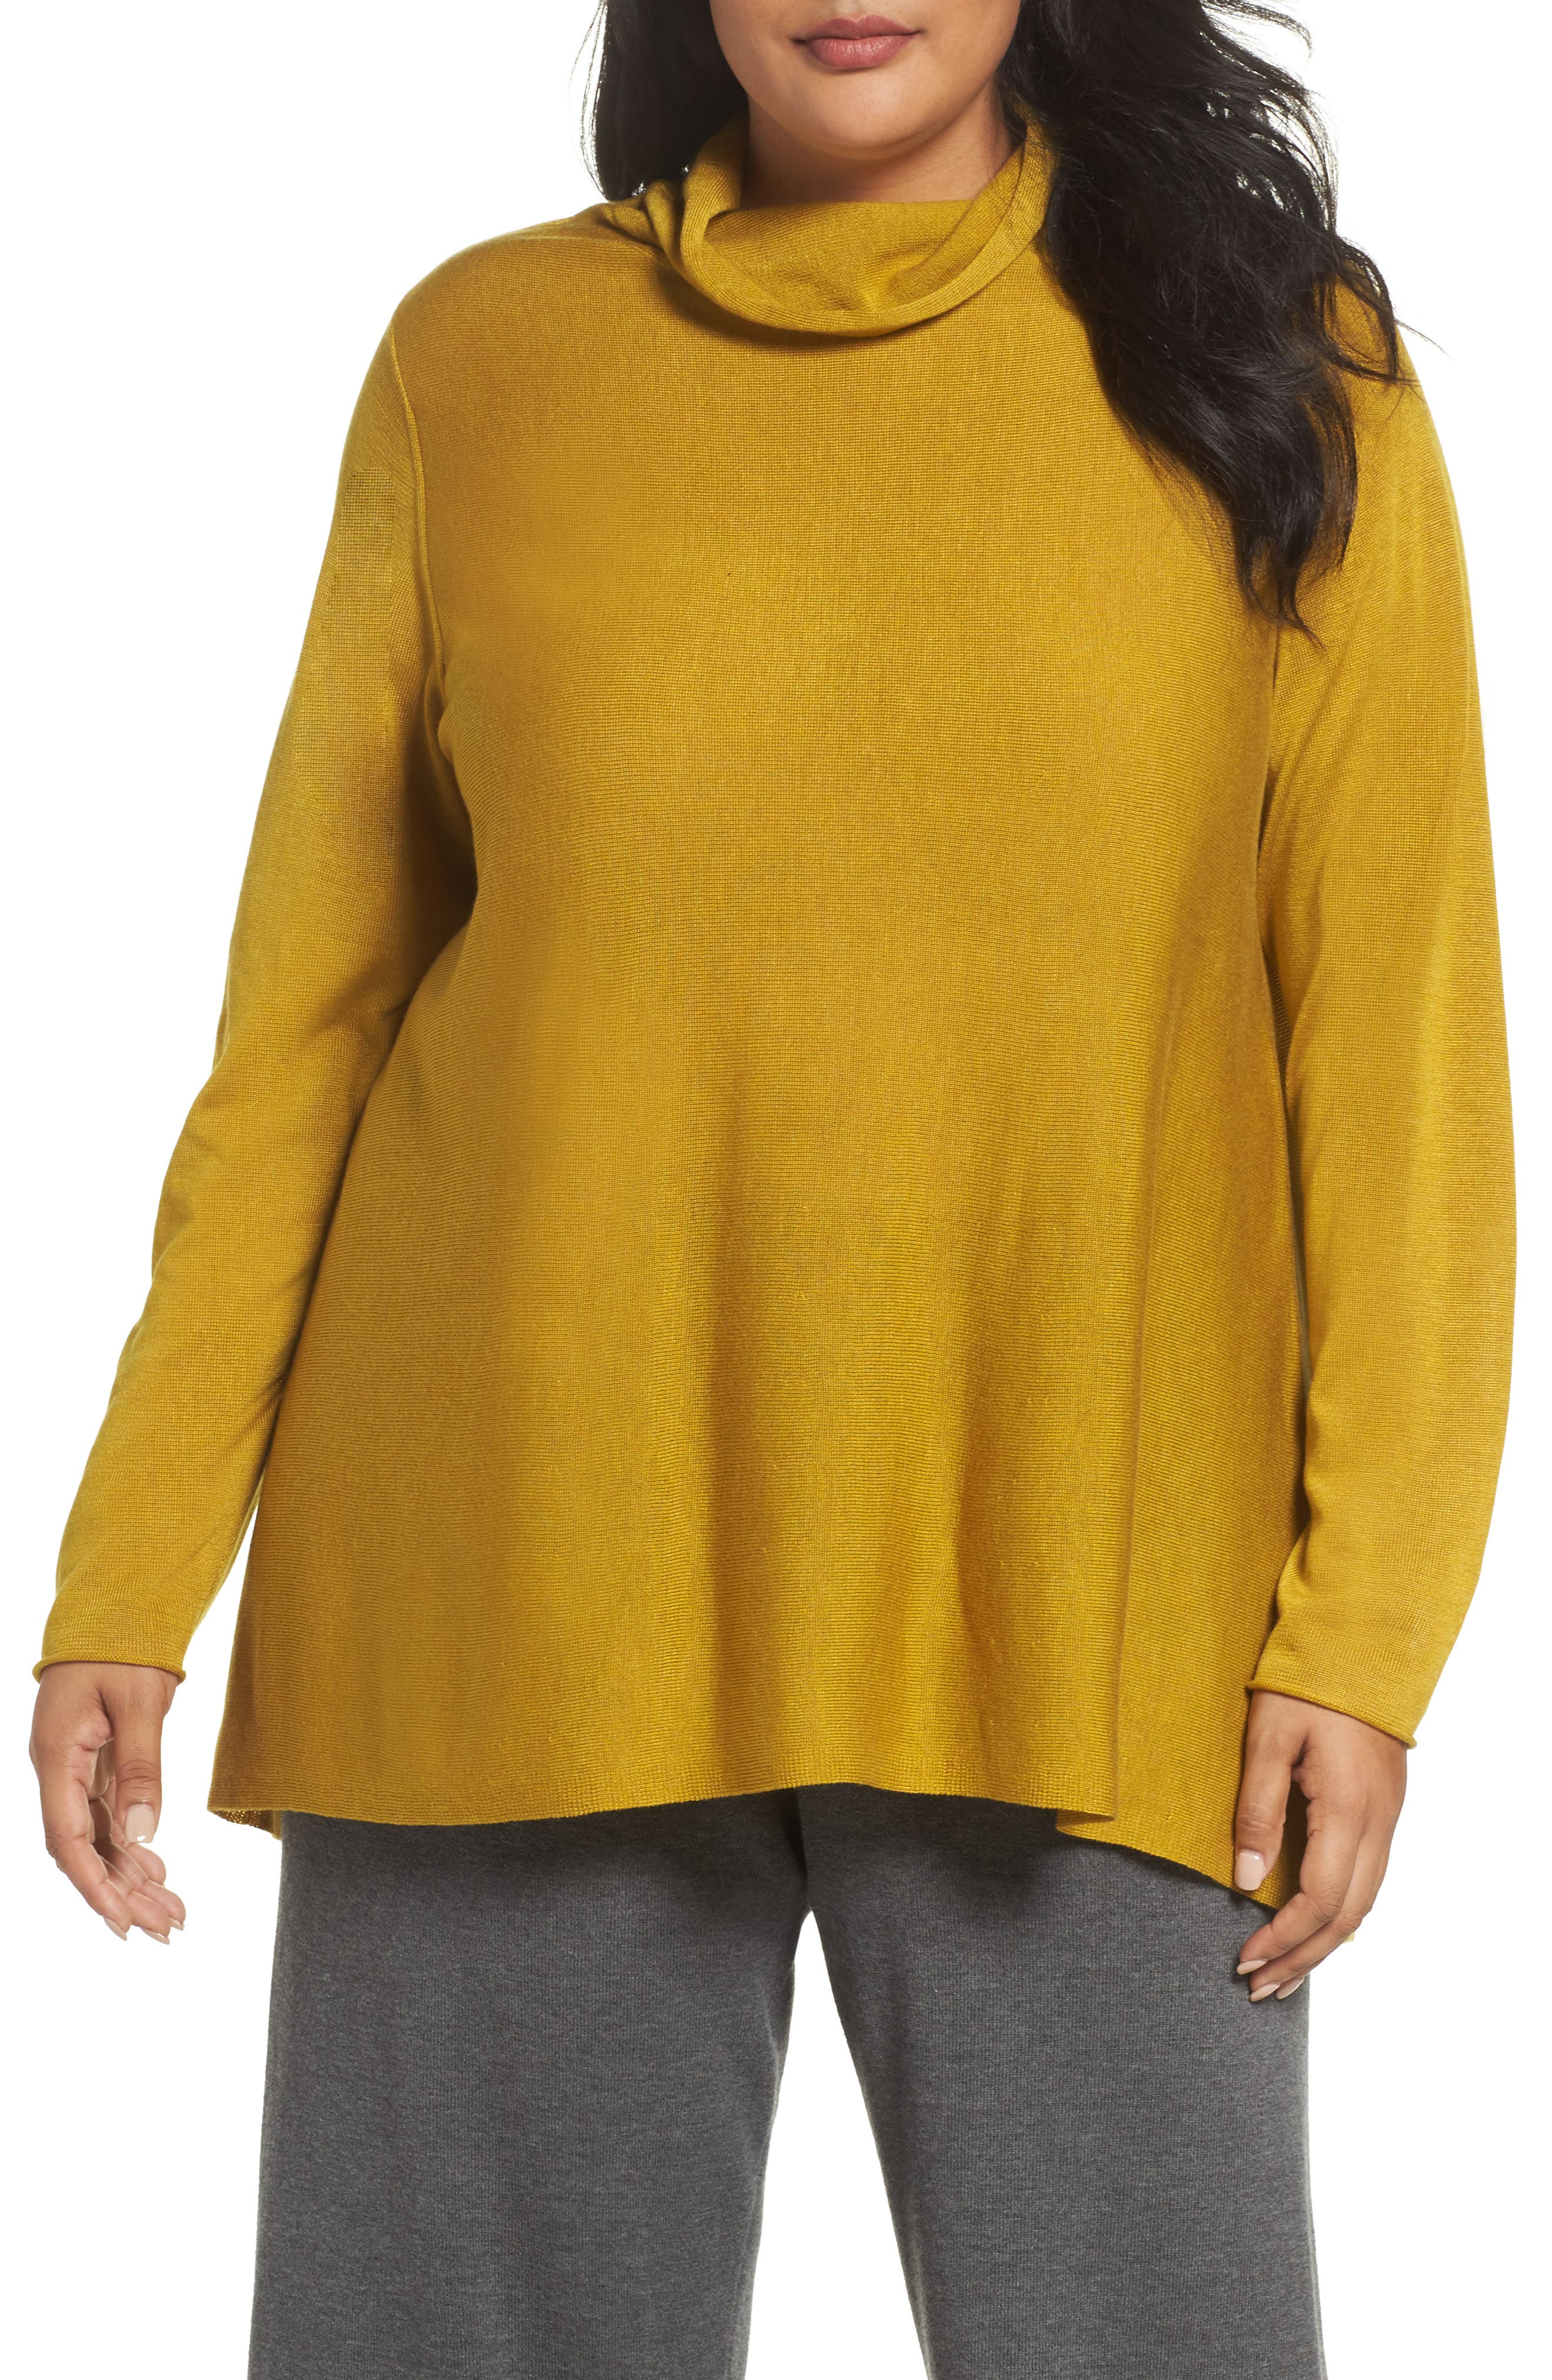 Alternate Image 1 Selected - Eileen Fisher Scrunch Turtleneck Sweater (Plus Size)